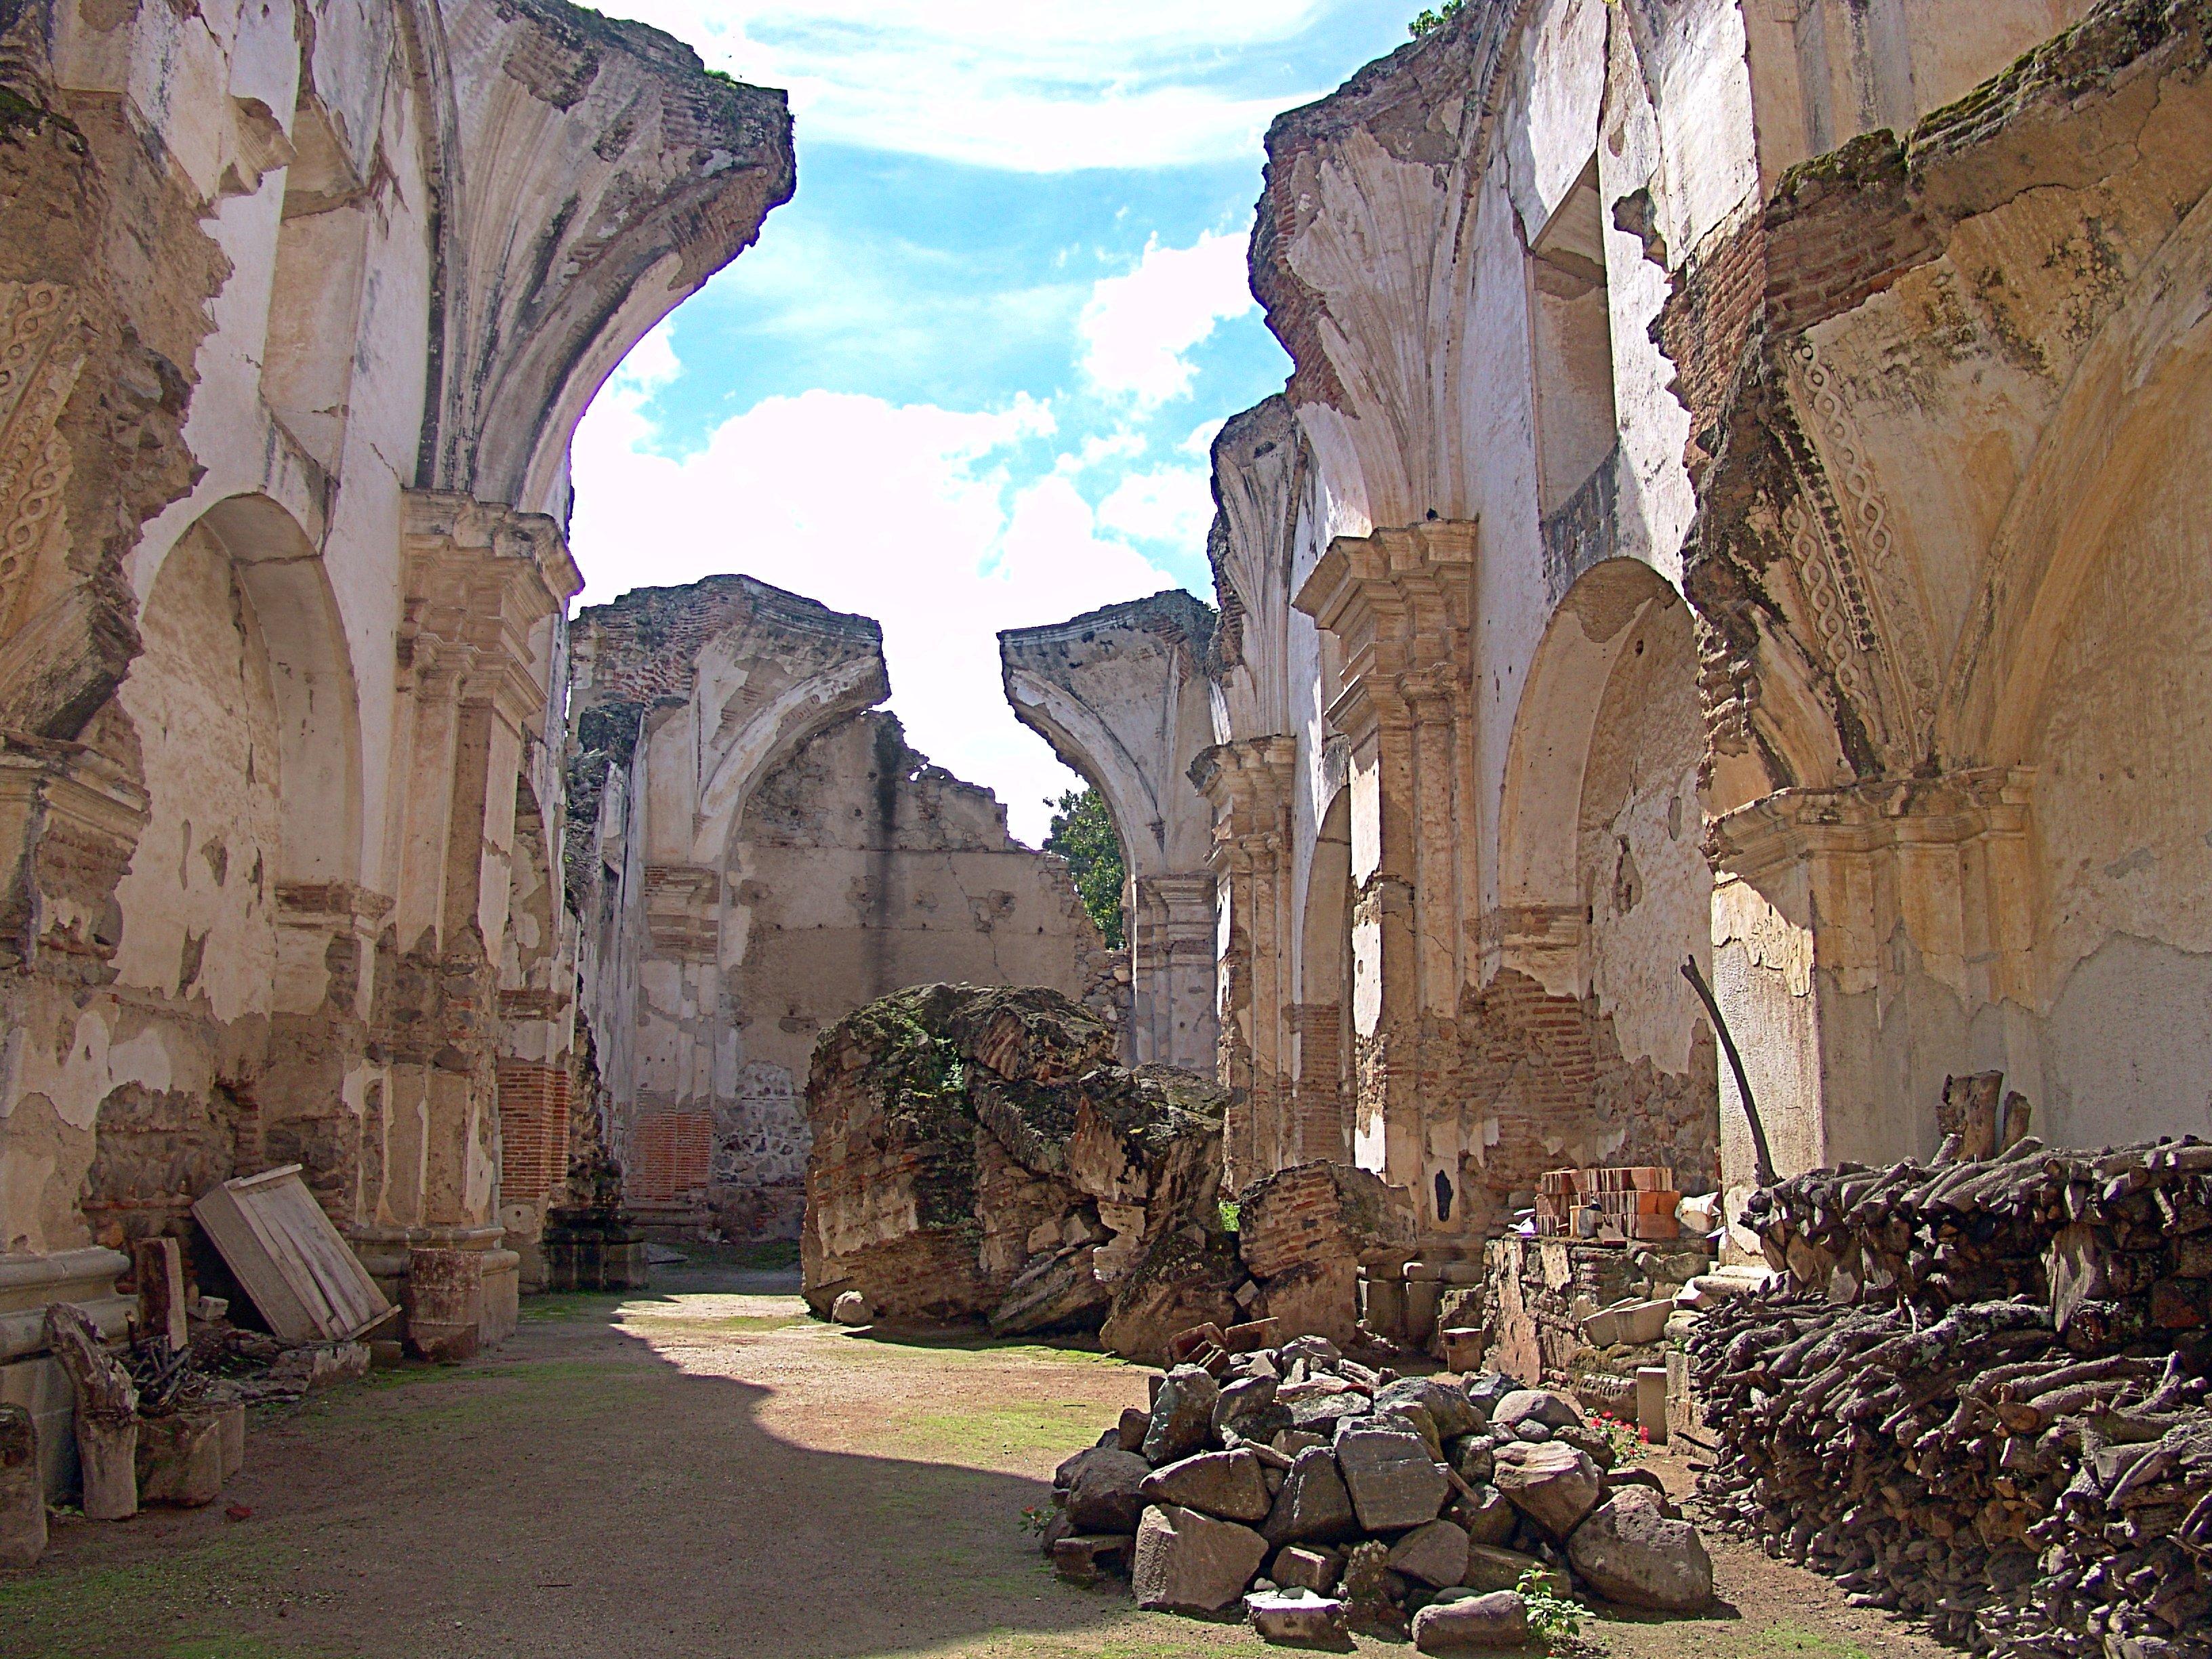 File:GT056-Antigua C-ruins.jpeg - Wikimedia Commons